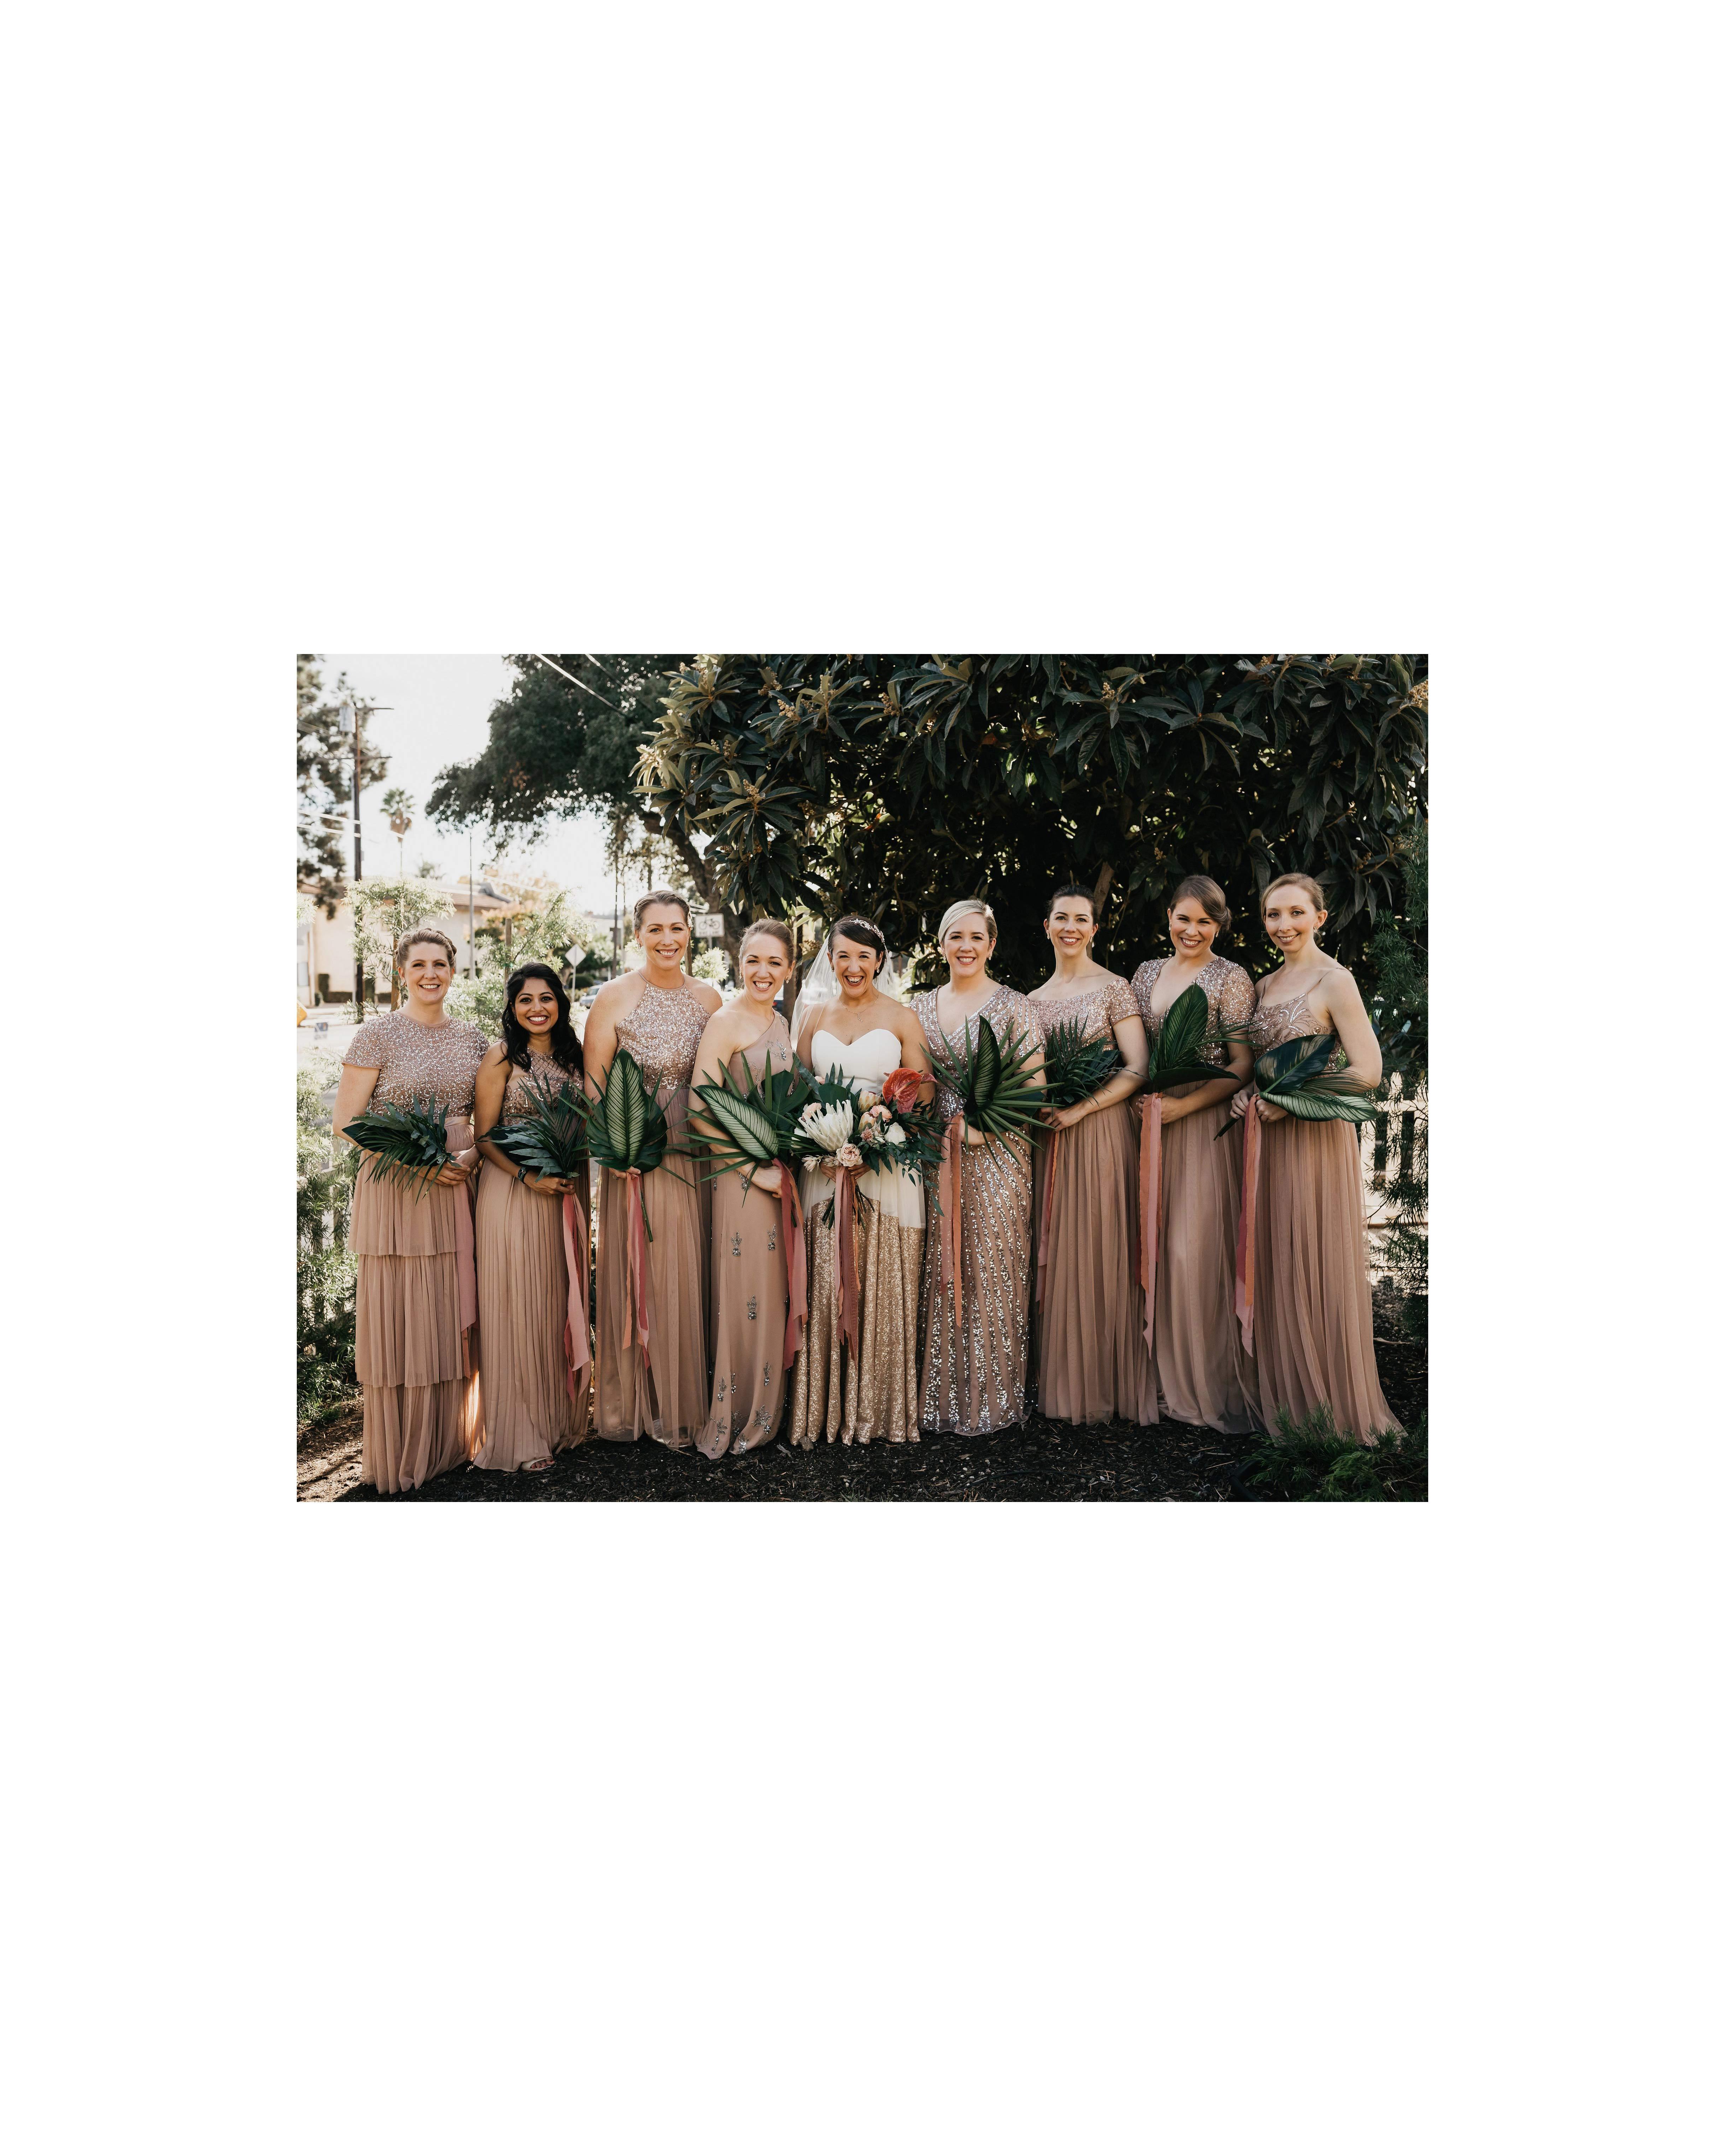 colleen pip wedding bridesmaids